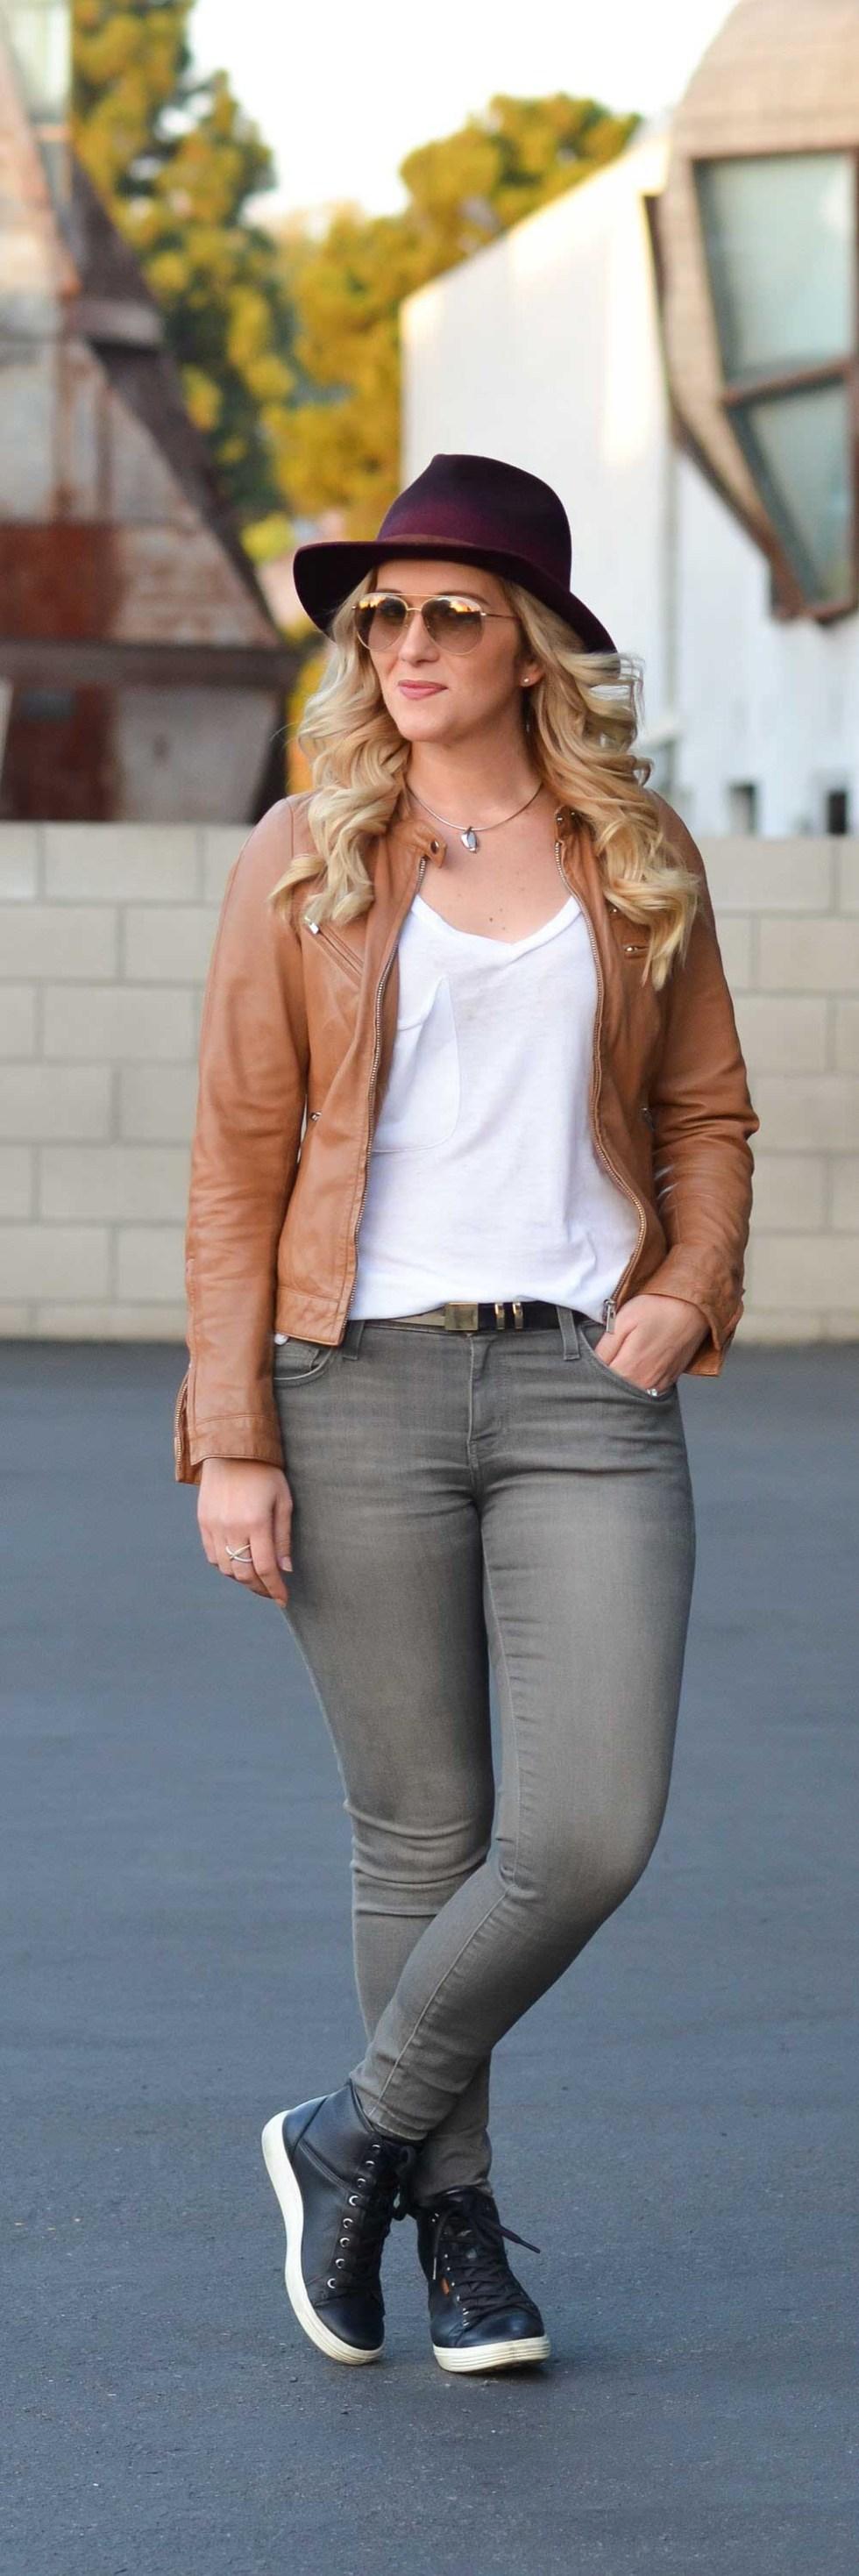 Grey Jeans Outfit for Women #jeans #denim #womensfashion #womensstyle #fashionblog #fashionblogger #currentelliott #leatherjacket #goorinbros